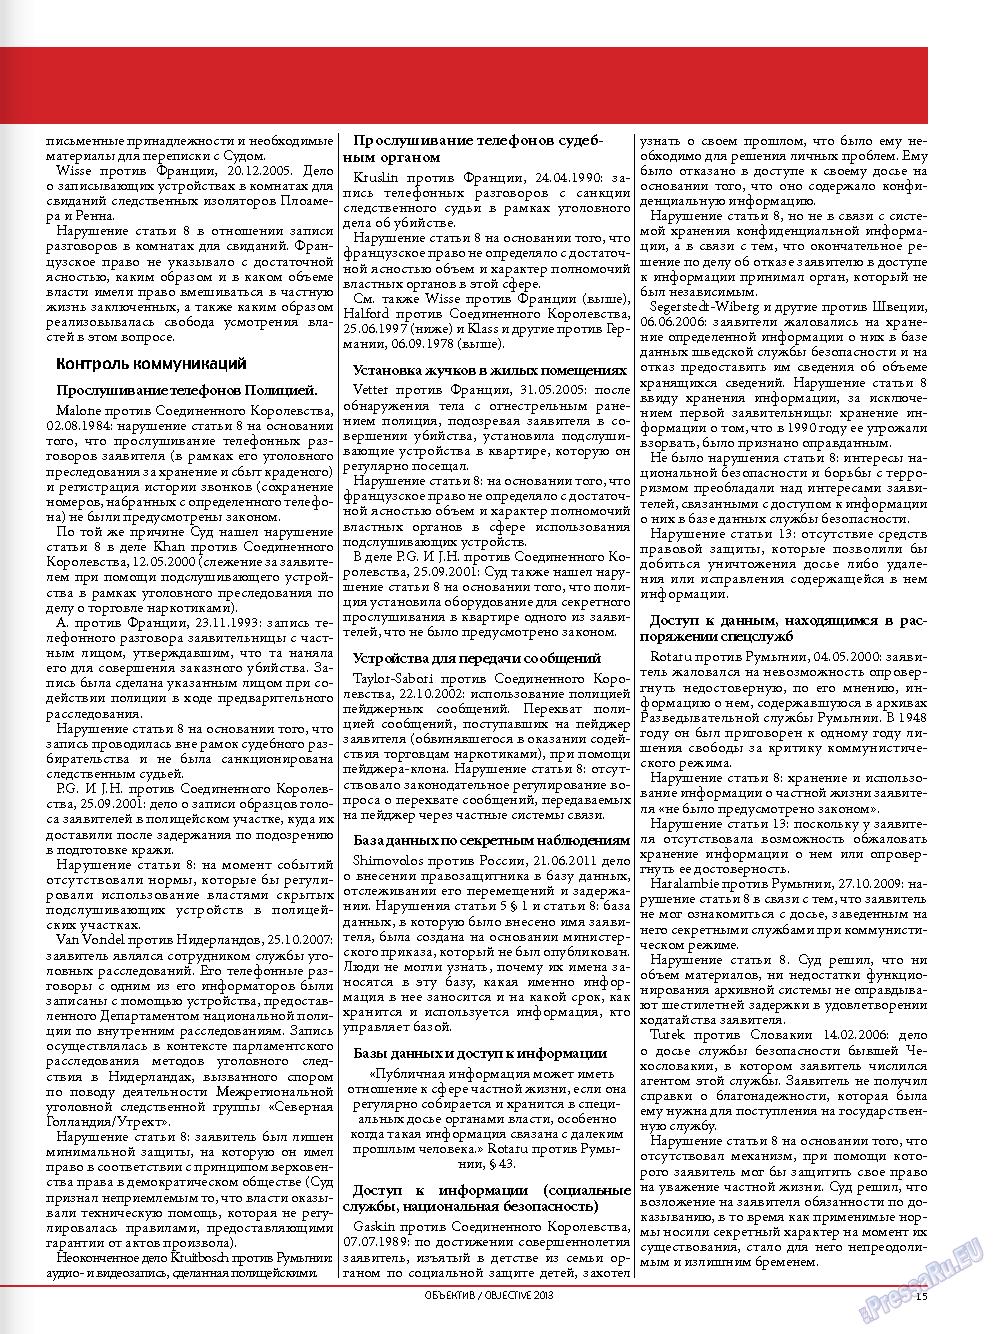 Объектив EU (журнал). 2013 год, номер 1, стр. 17